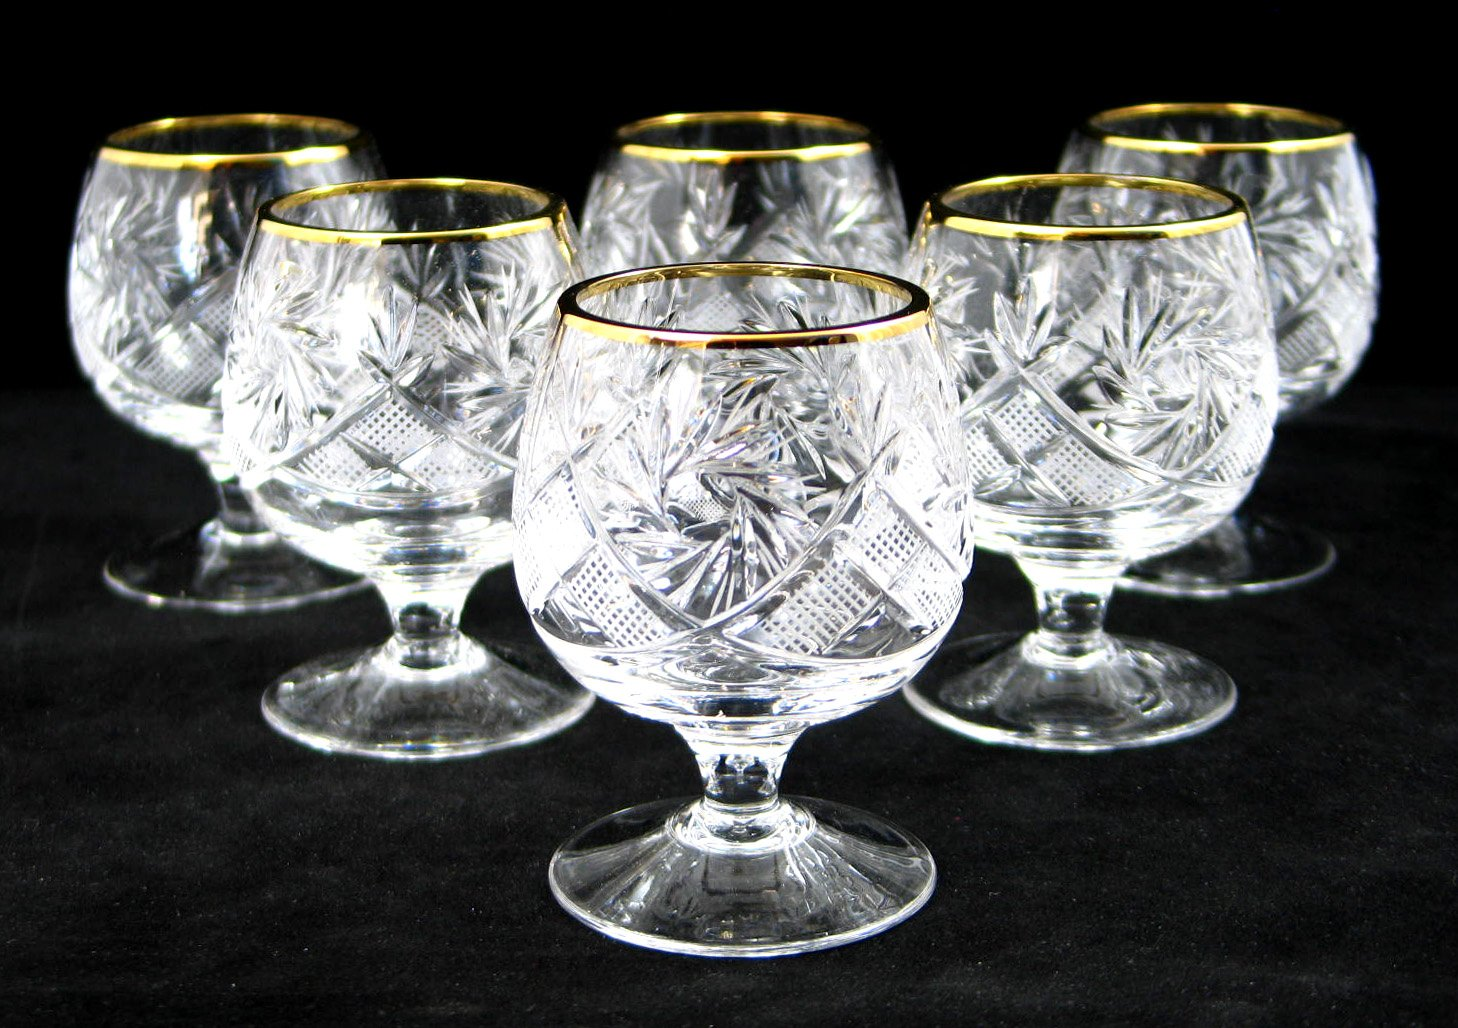 Set of 6 Russian Cut Crystal Cognac Scotch Whiskey Stemmed Snifter Goblet Glass, 24K Gold Rimmed 5 Oz. Vodka Liquor Old…